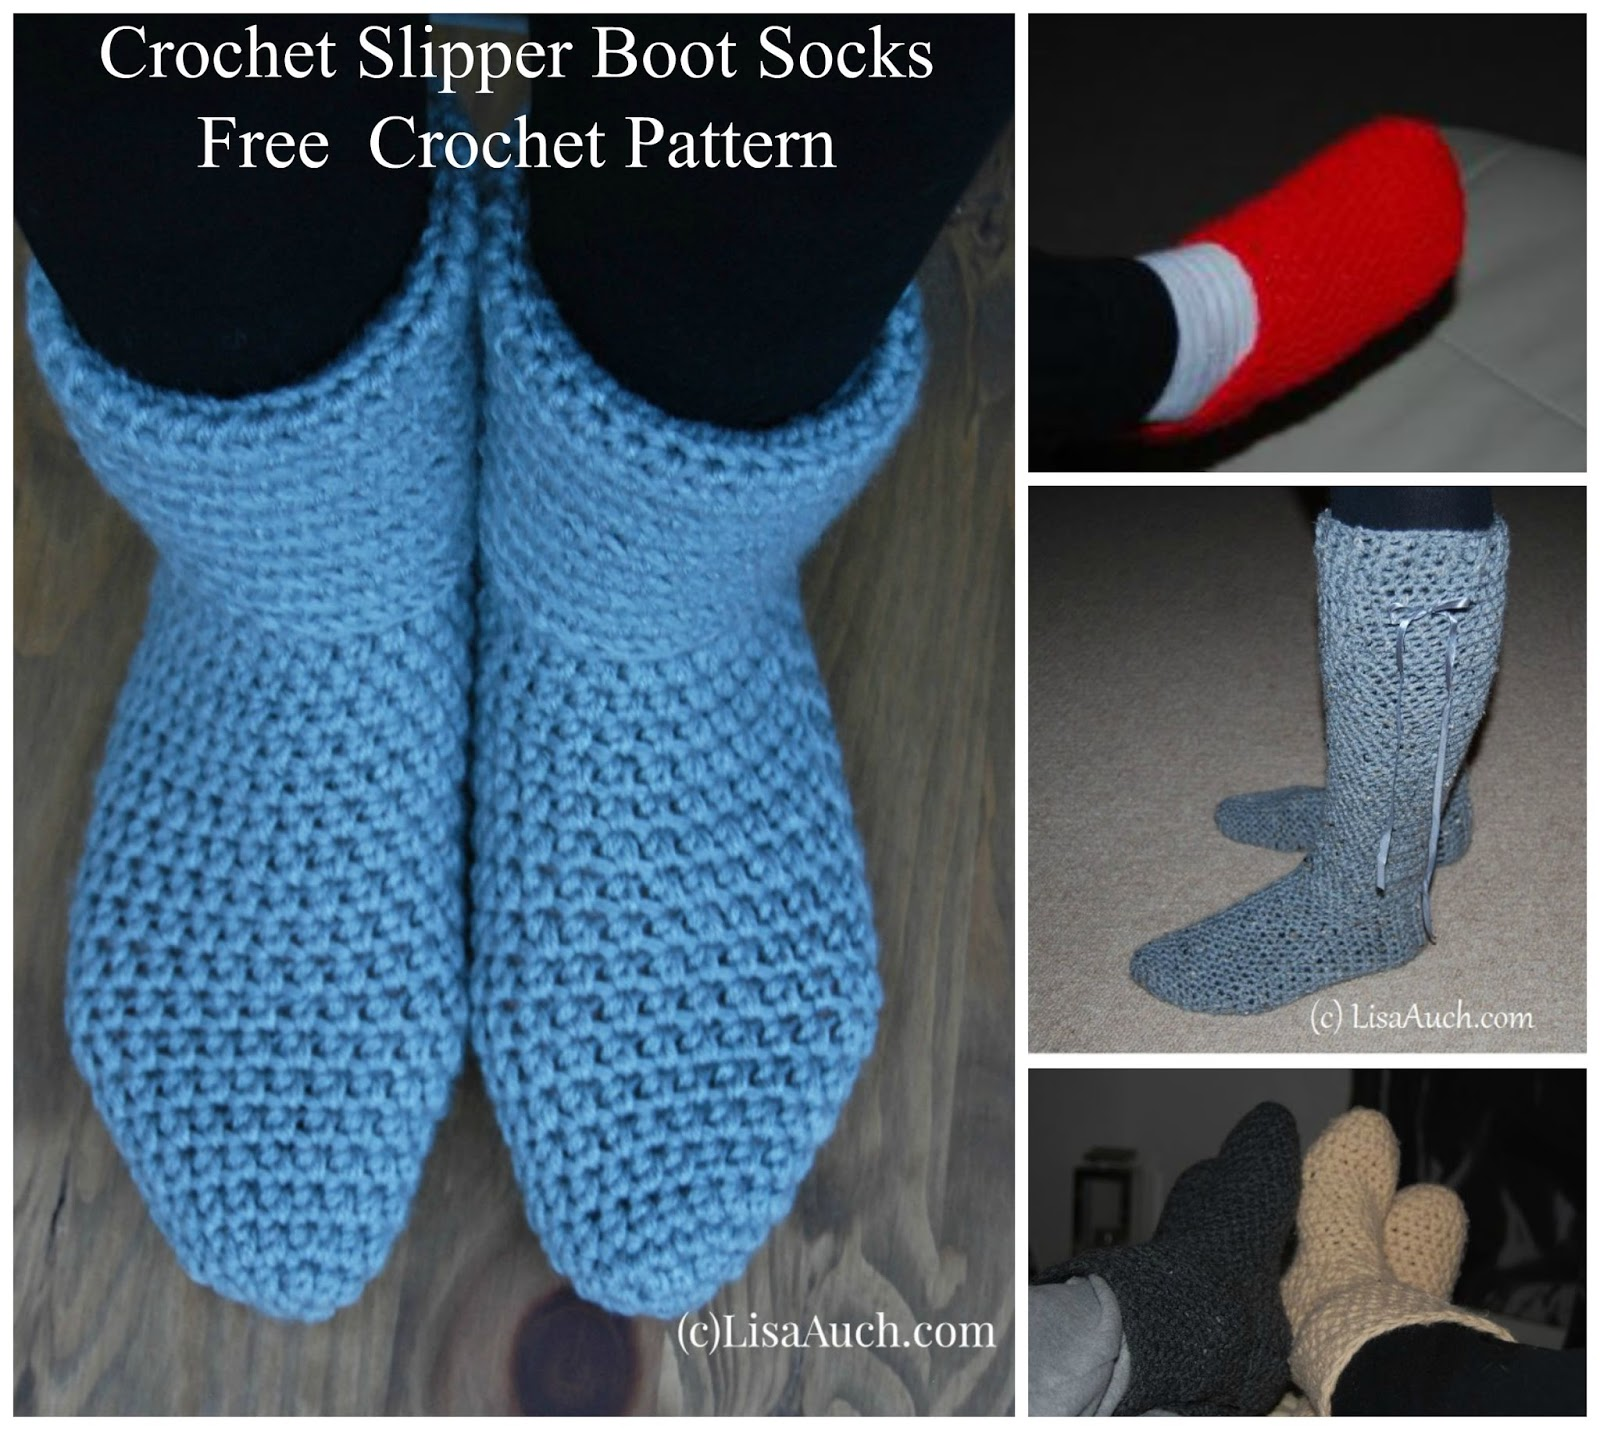 Free easy crochet slipper patterns for adults